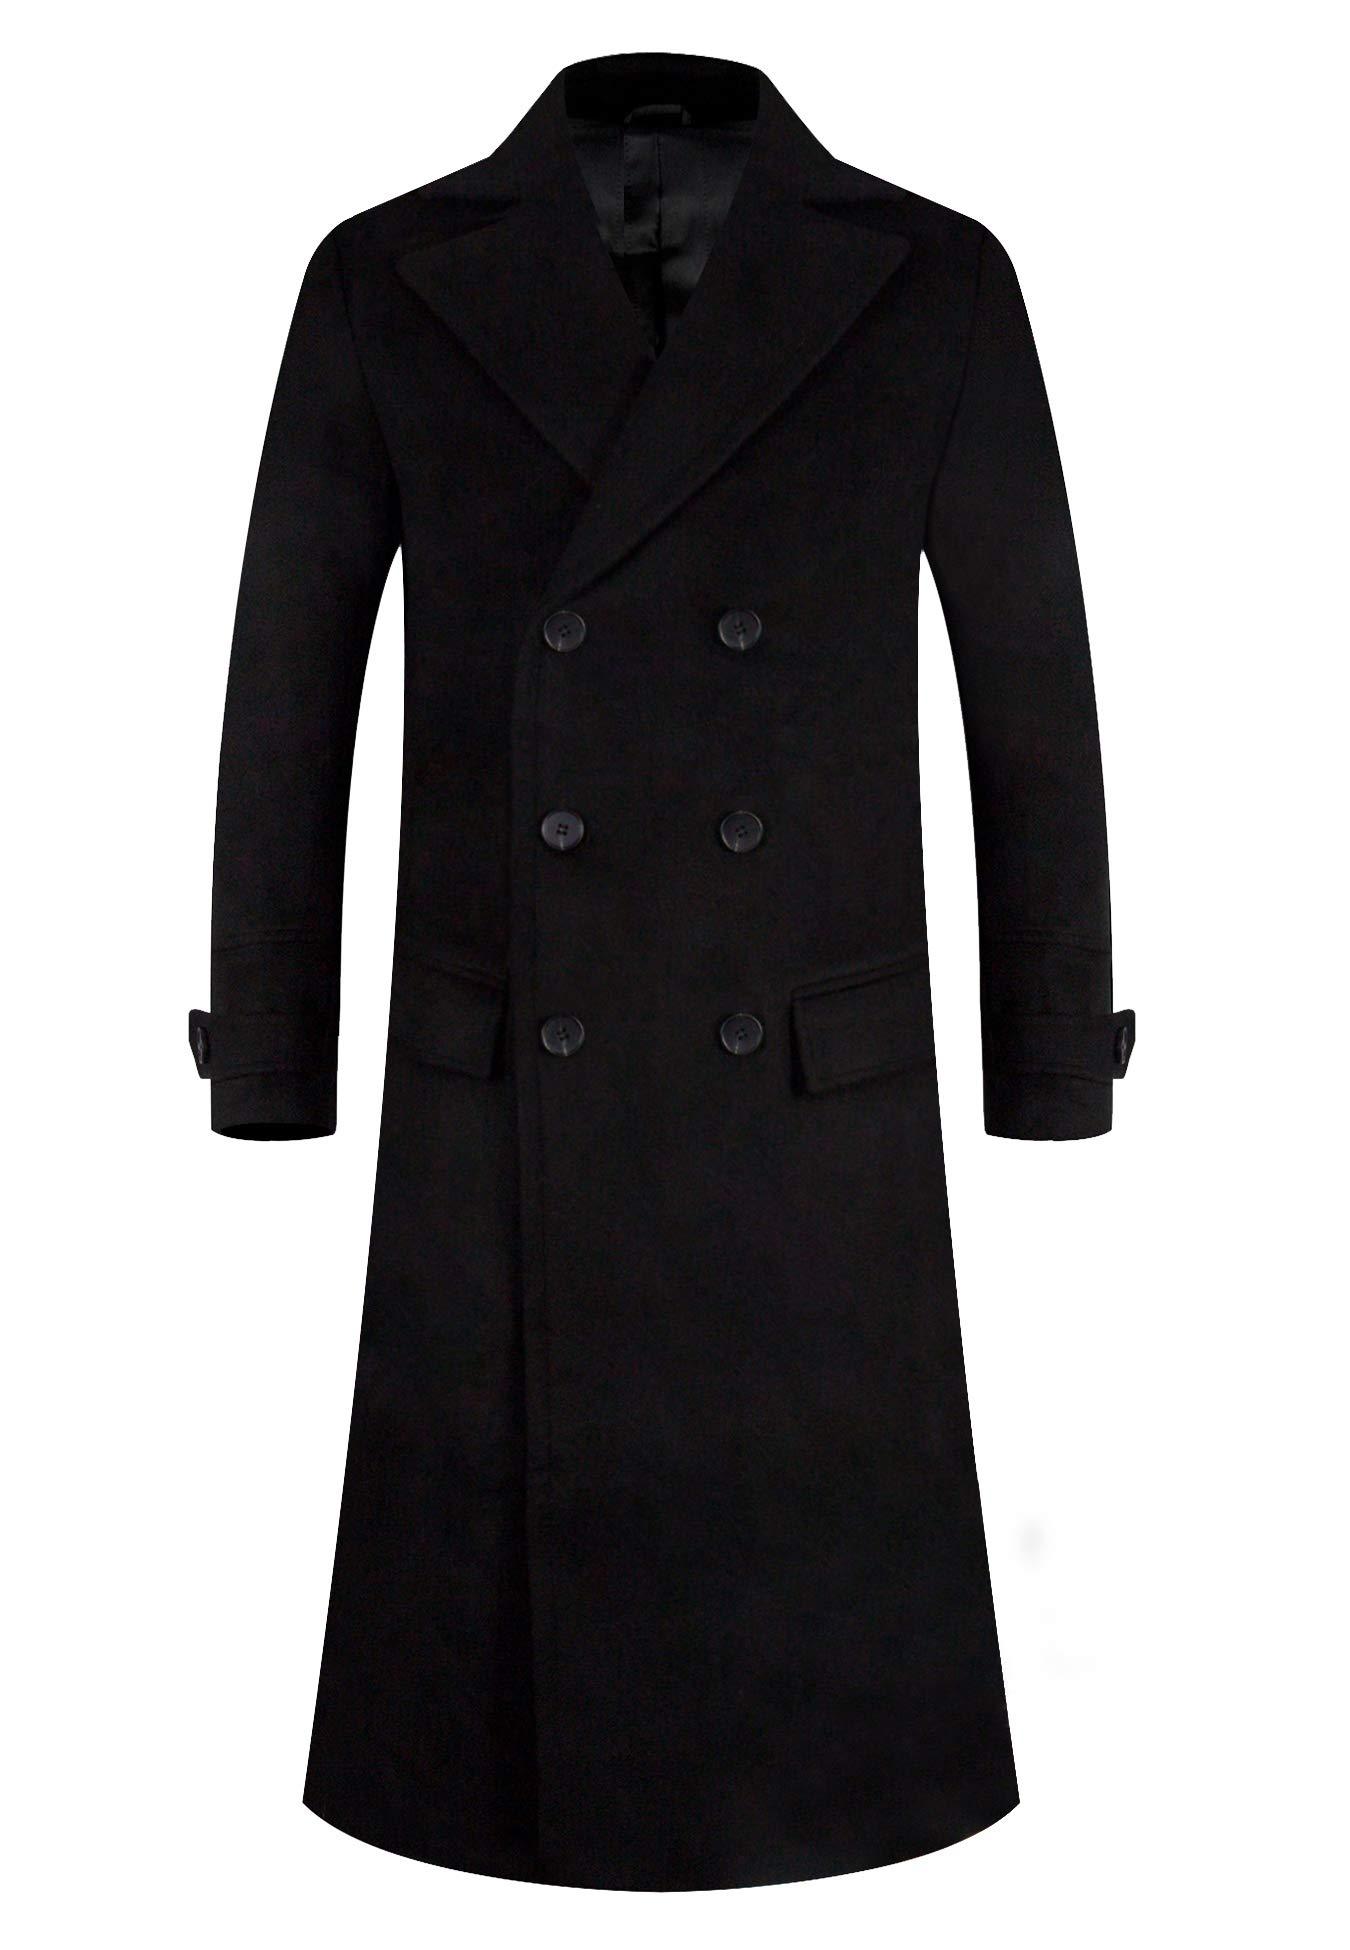 APTRO Men's Full Length Wool Trench Coat Fleece Lining Double Breasted Overcoat 1818 Black XXL by APTRO